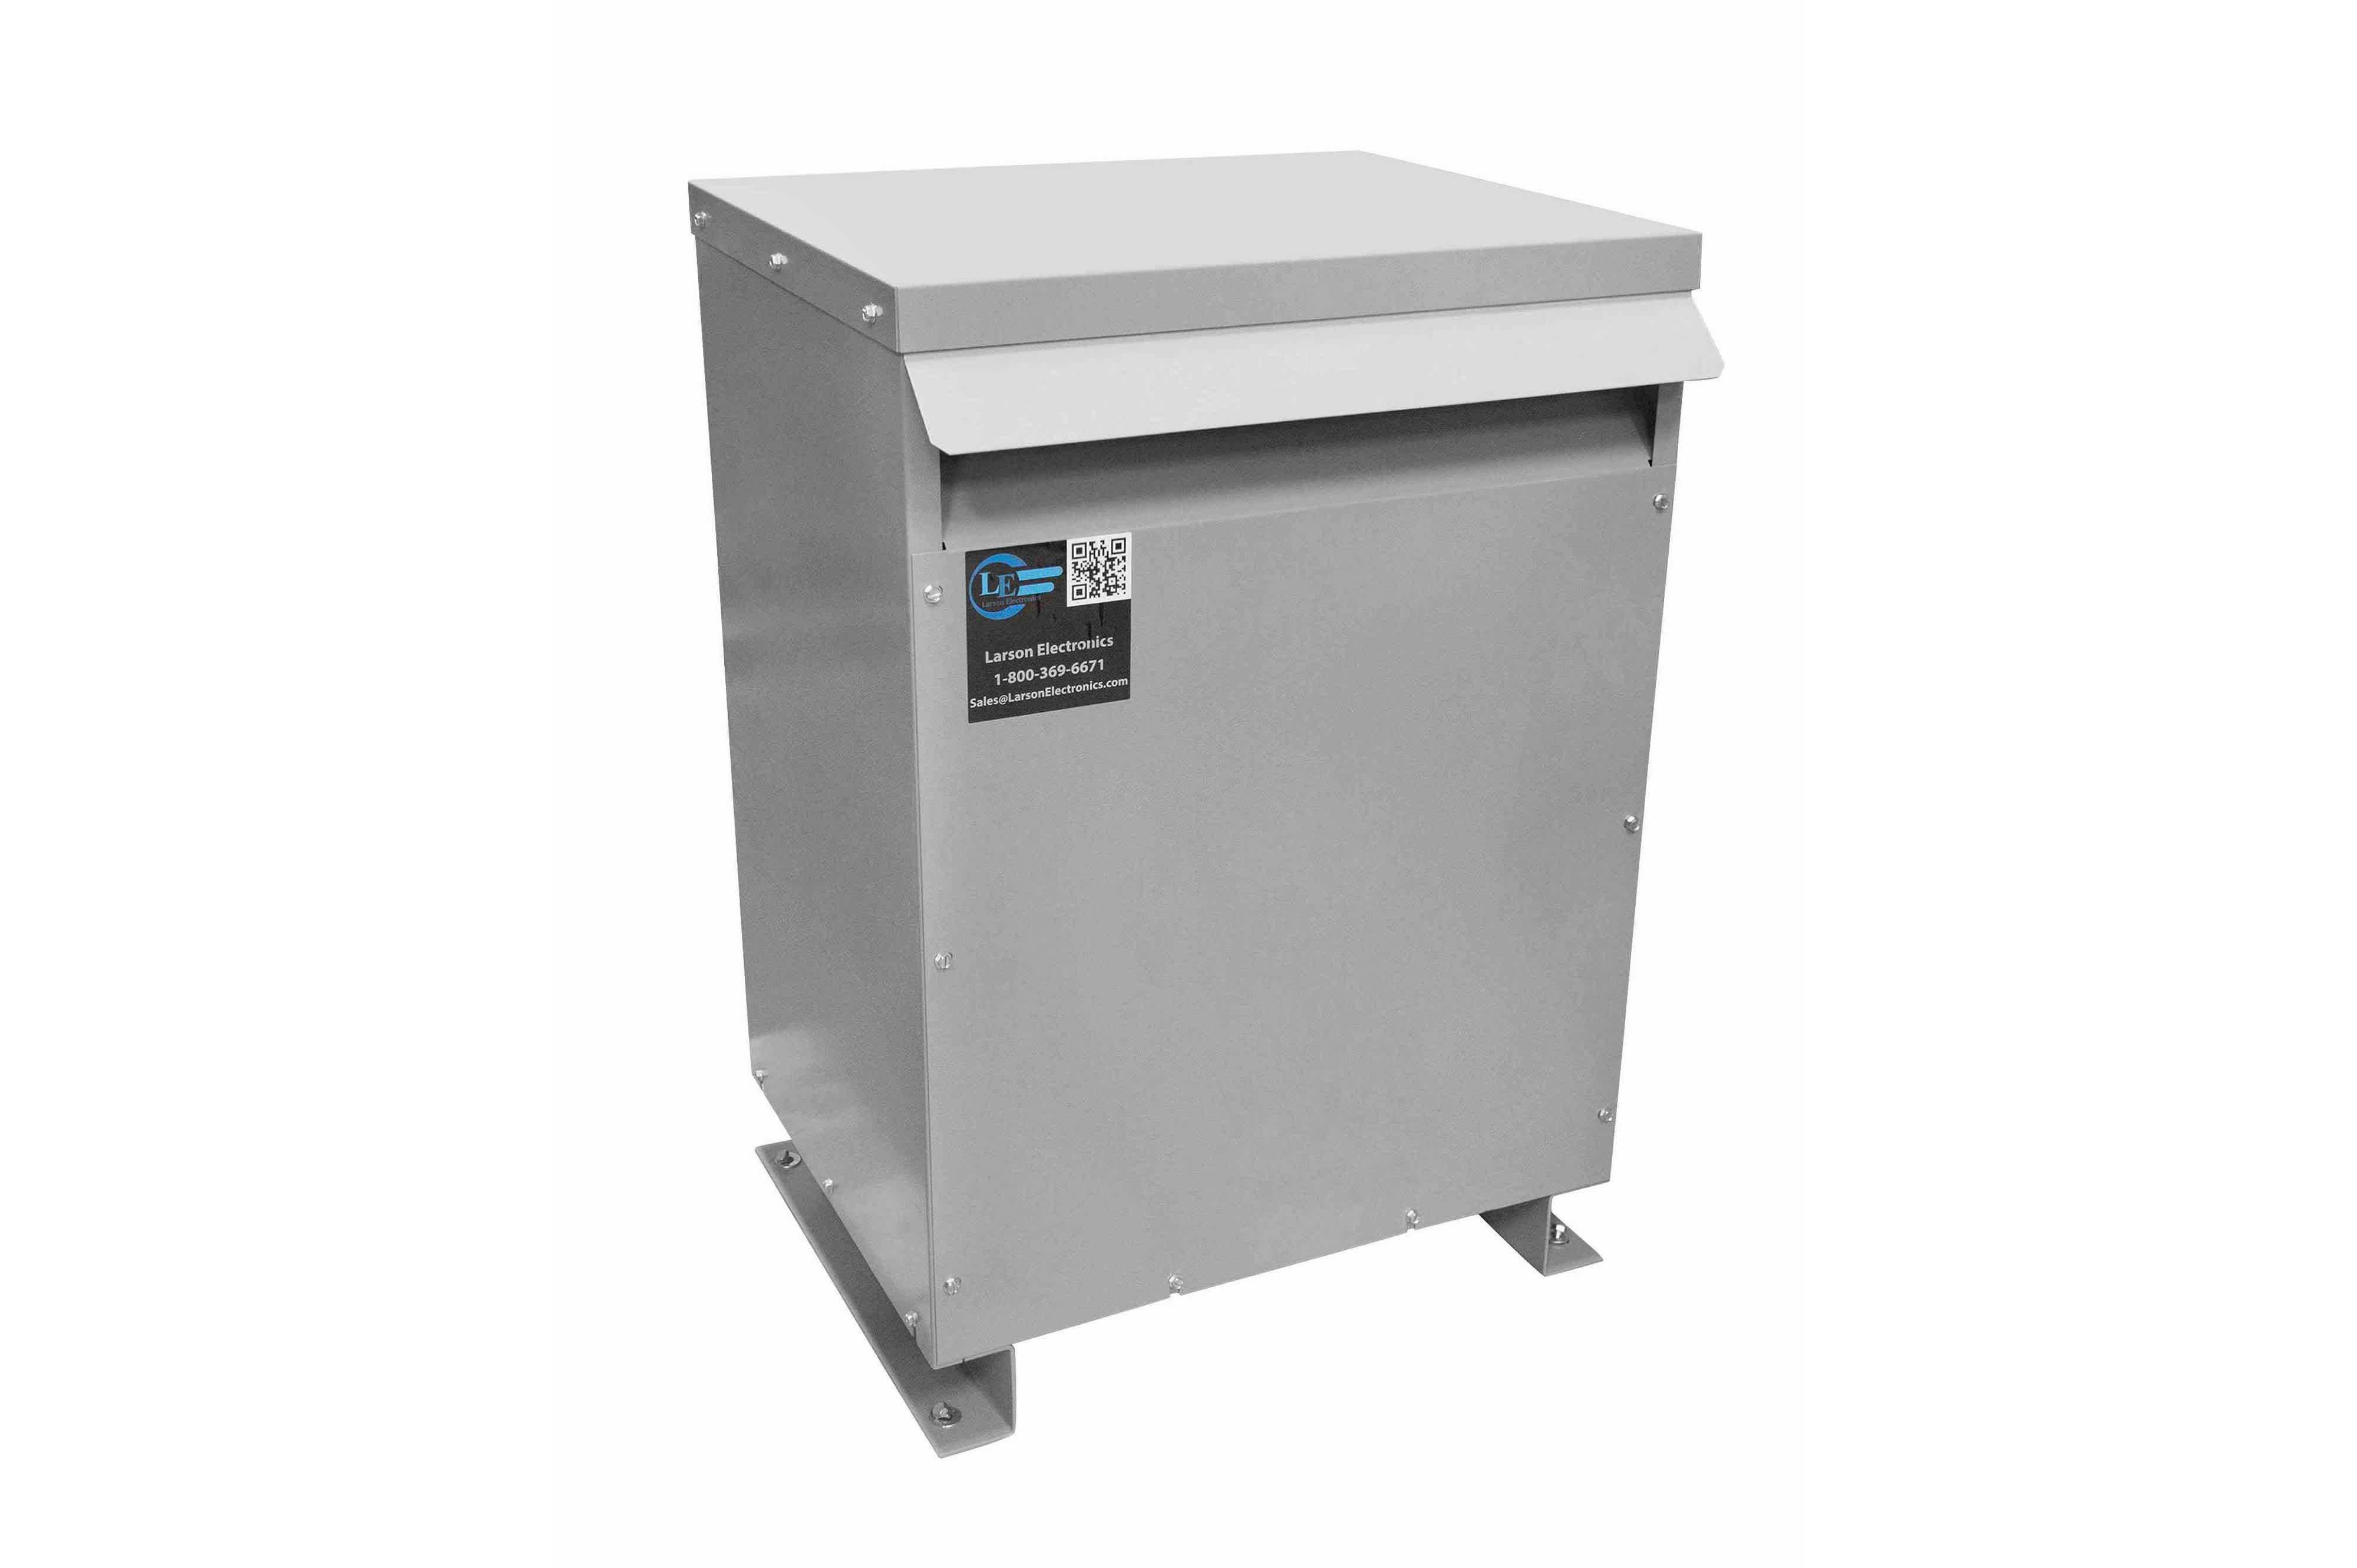 225 kVA 3PH Isolation Transformer, 460V Wye Primary, 575Y/332 Wye-N Secondary, N3R, Ventilated, 60 Hz